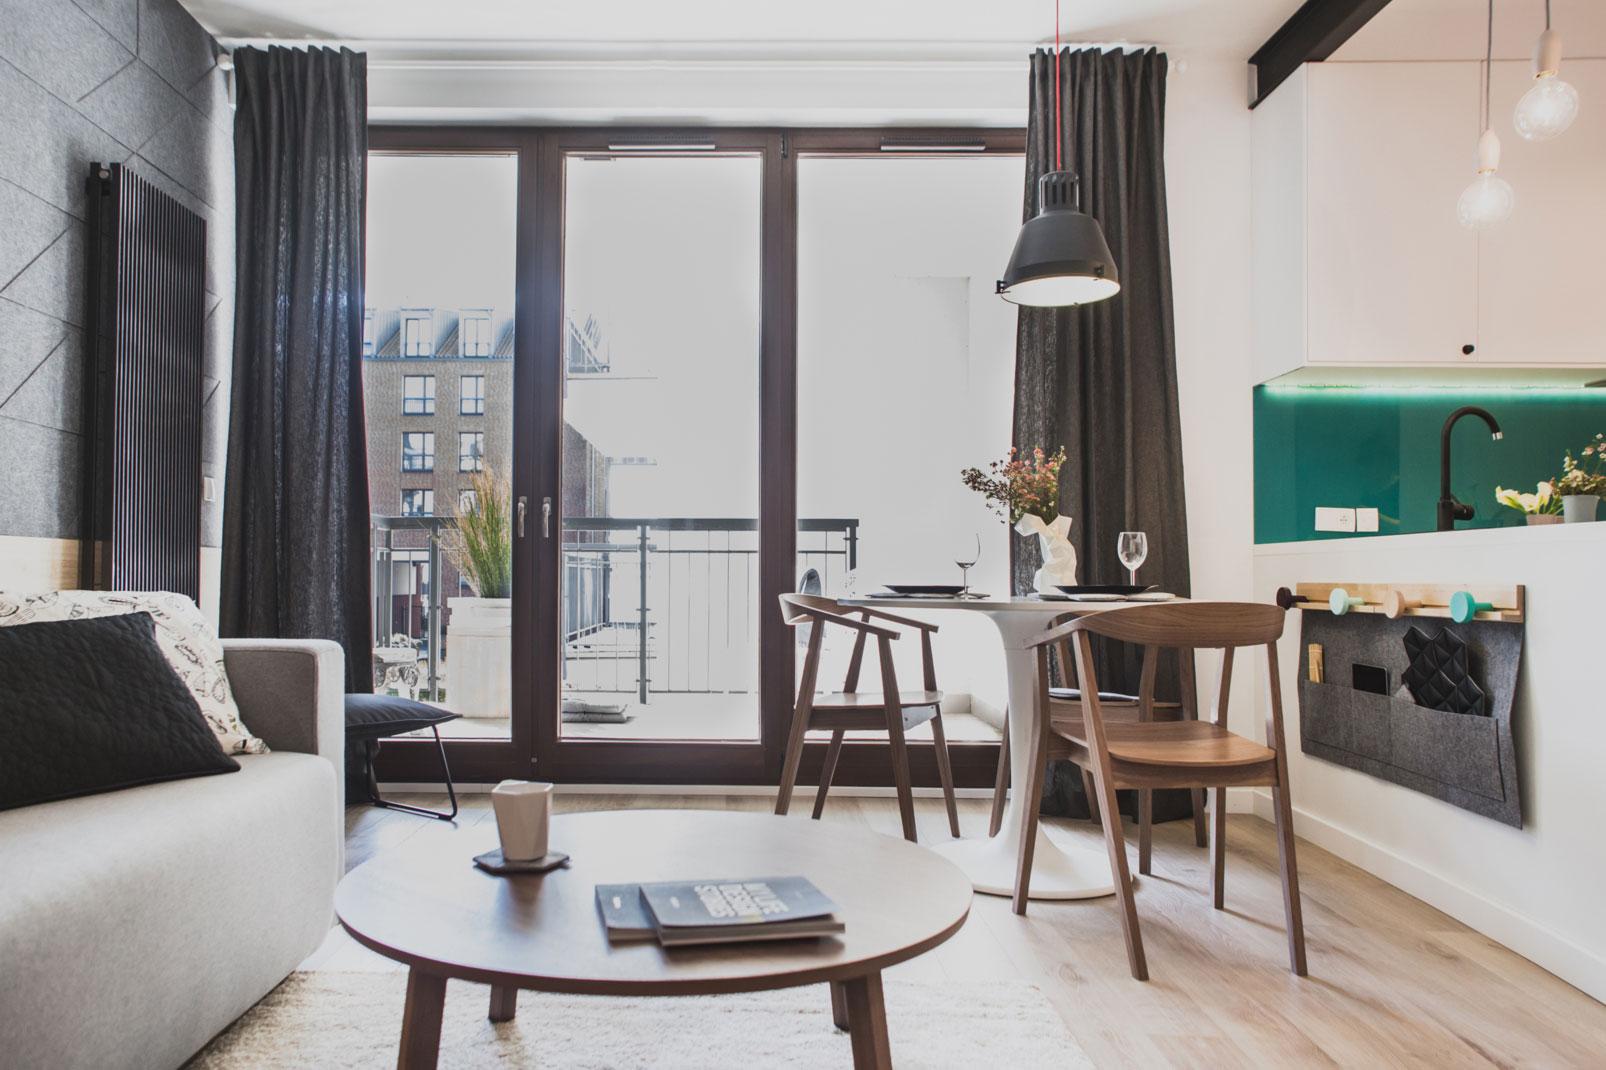 Szafarnia 2 Compact Apartment by Raca Architekci-13